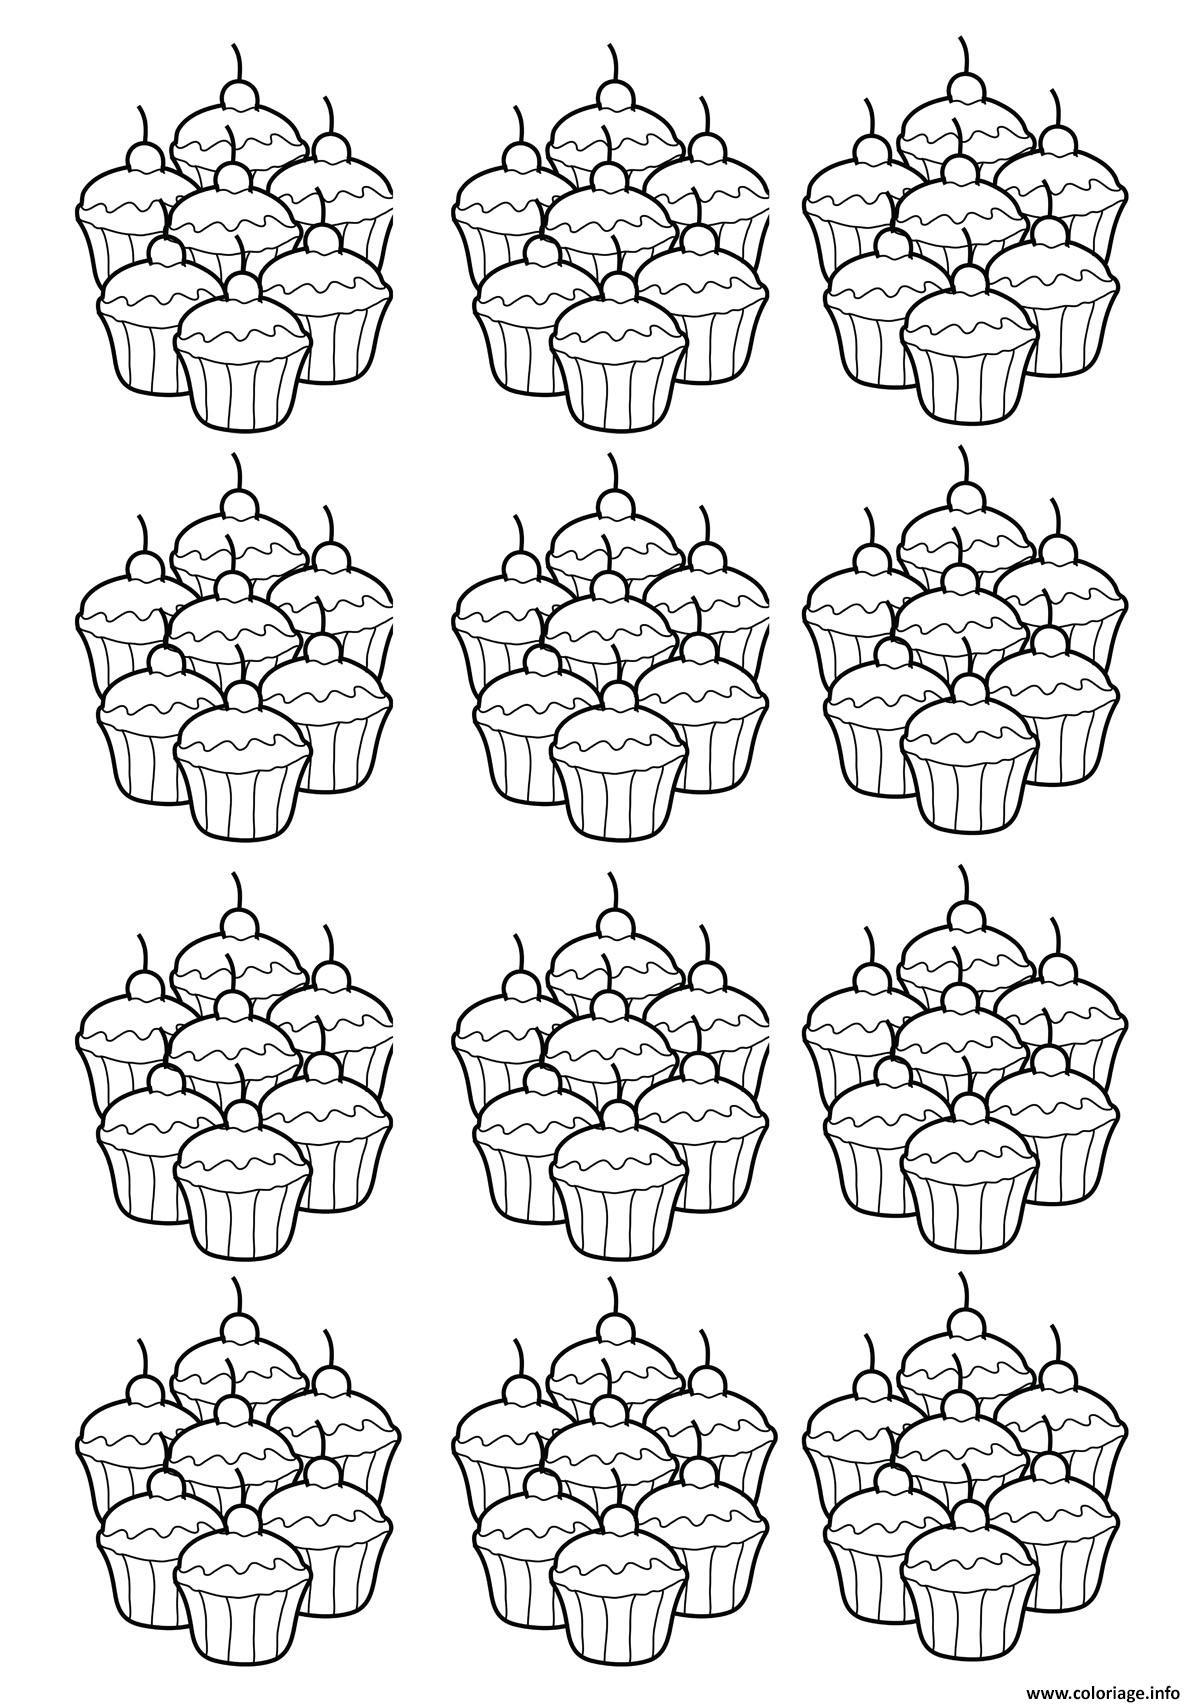 Coloriage Adulte Cupcakes Mosaique Dessin